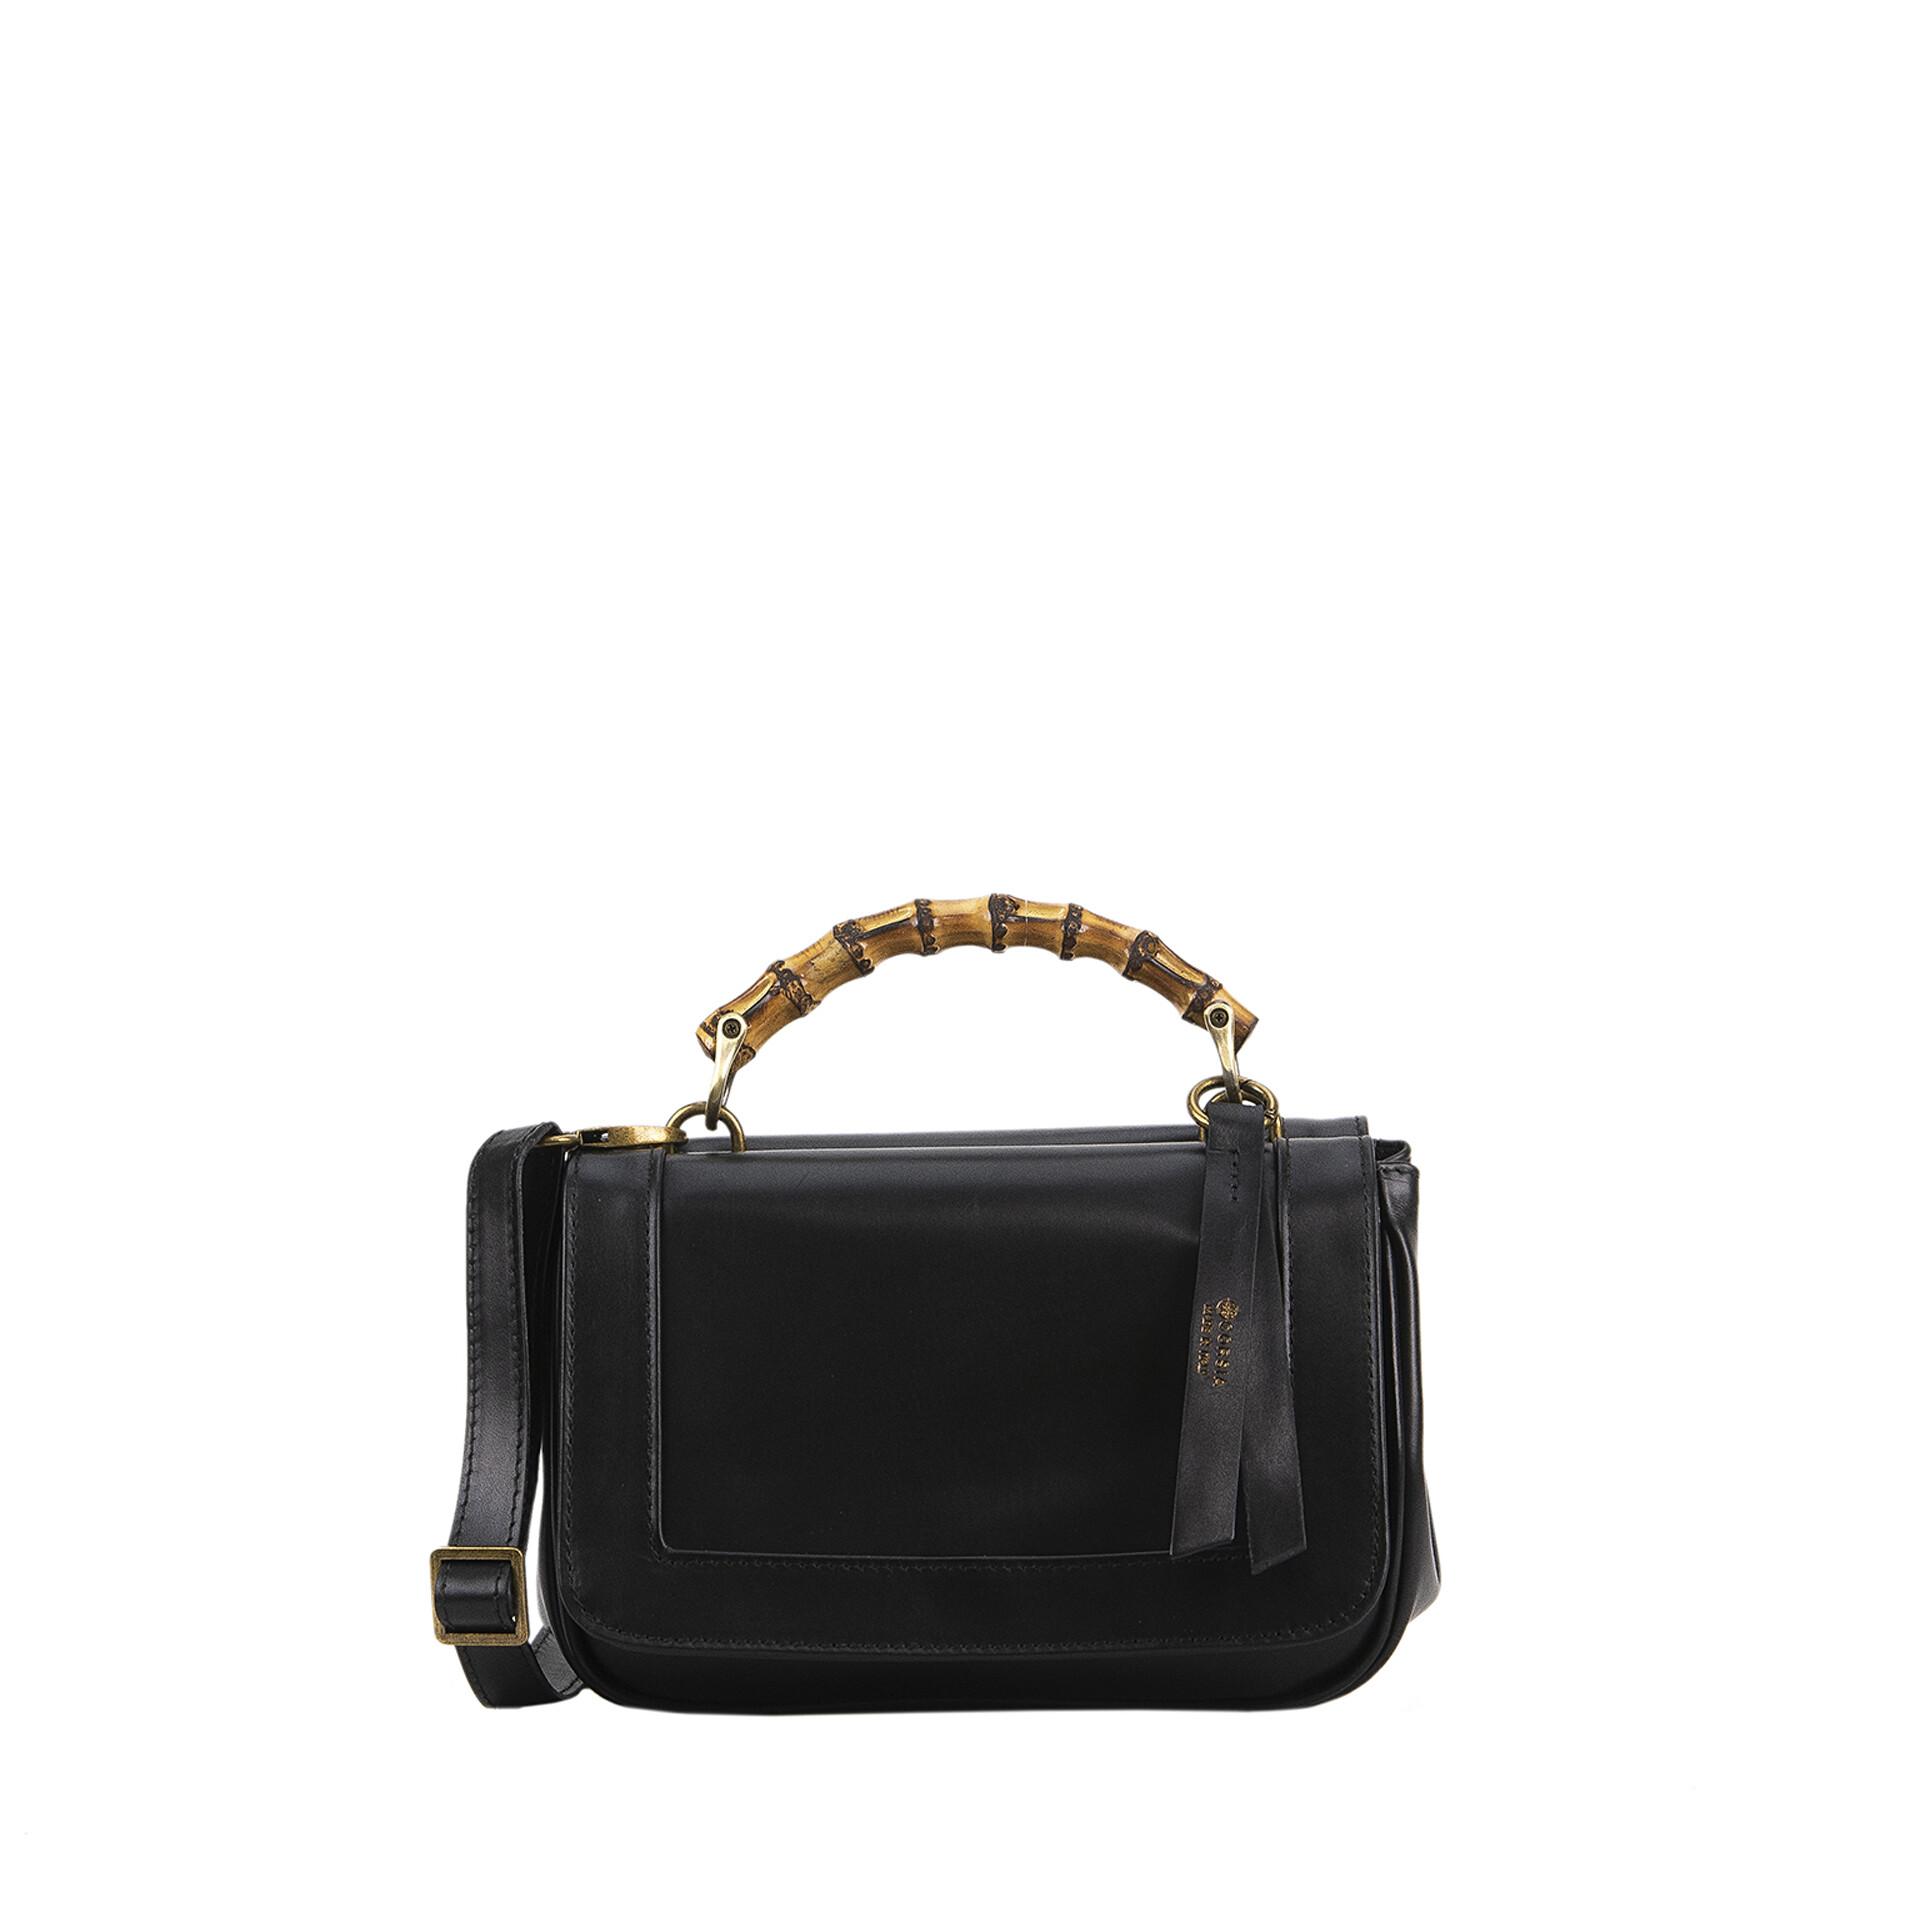 black nappa leather handbag made in Italy